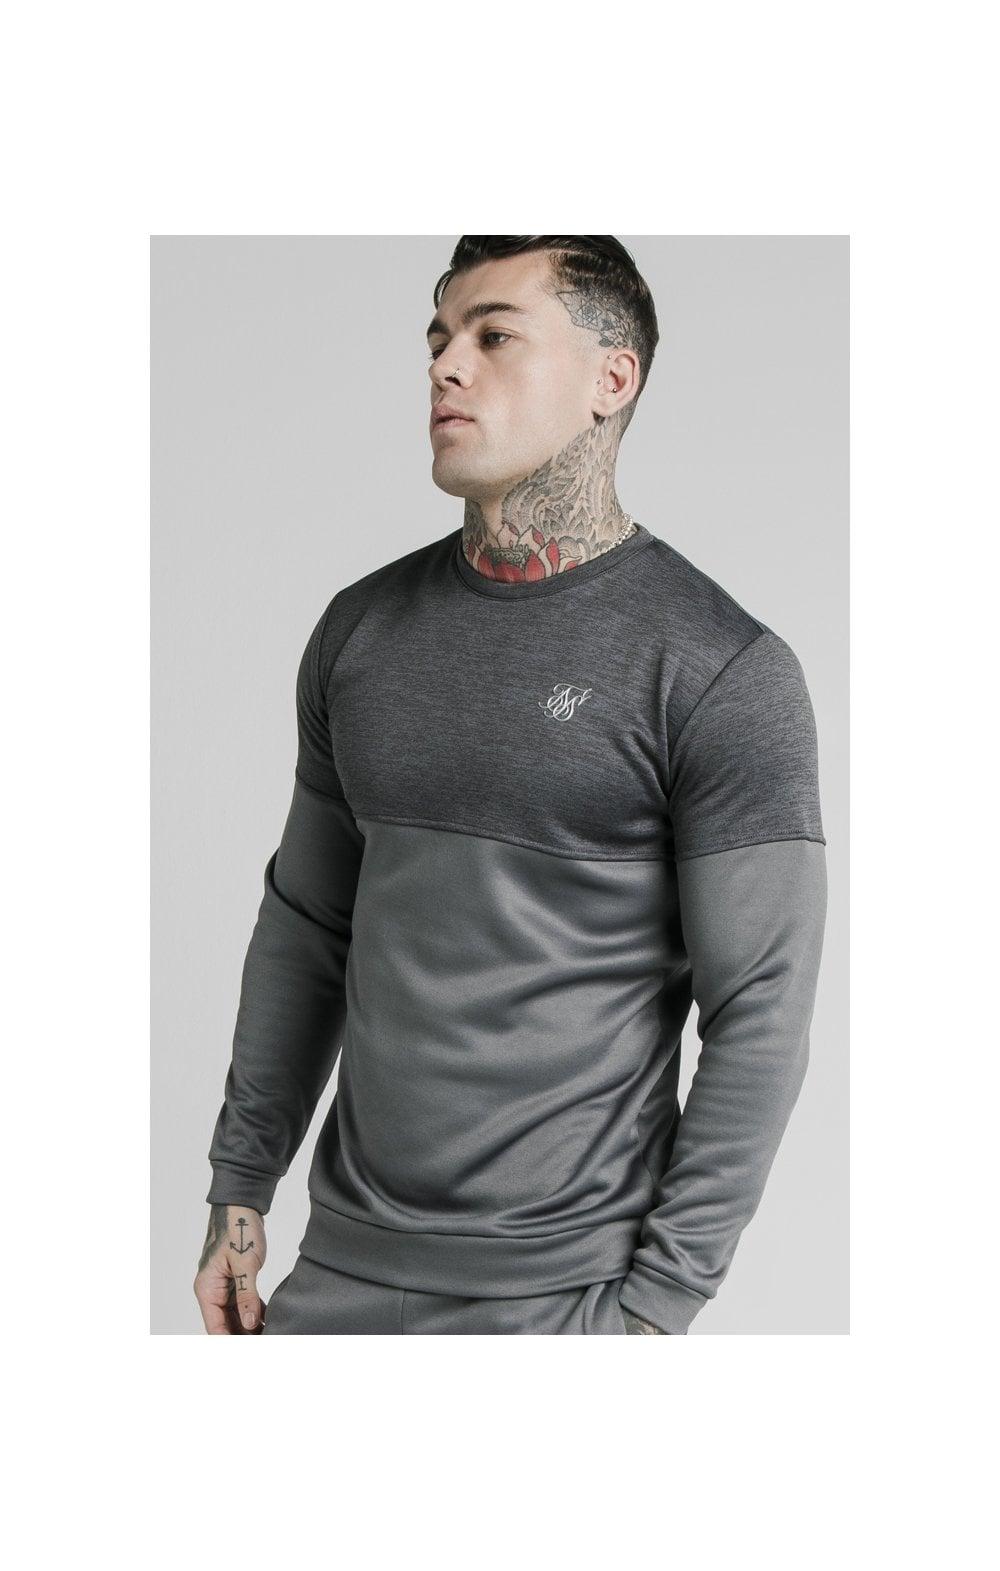 SikSilk Cut & Sew Sweater - Grey MEN SIZES TOP: Small